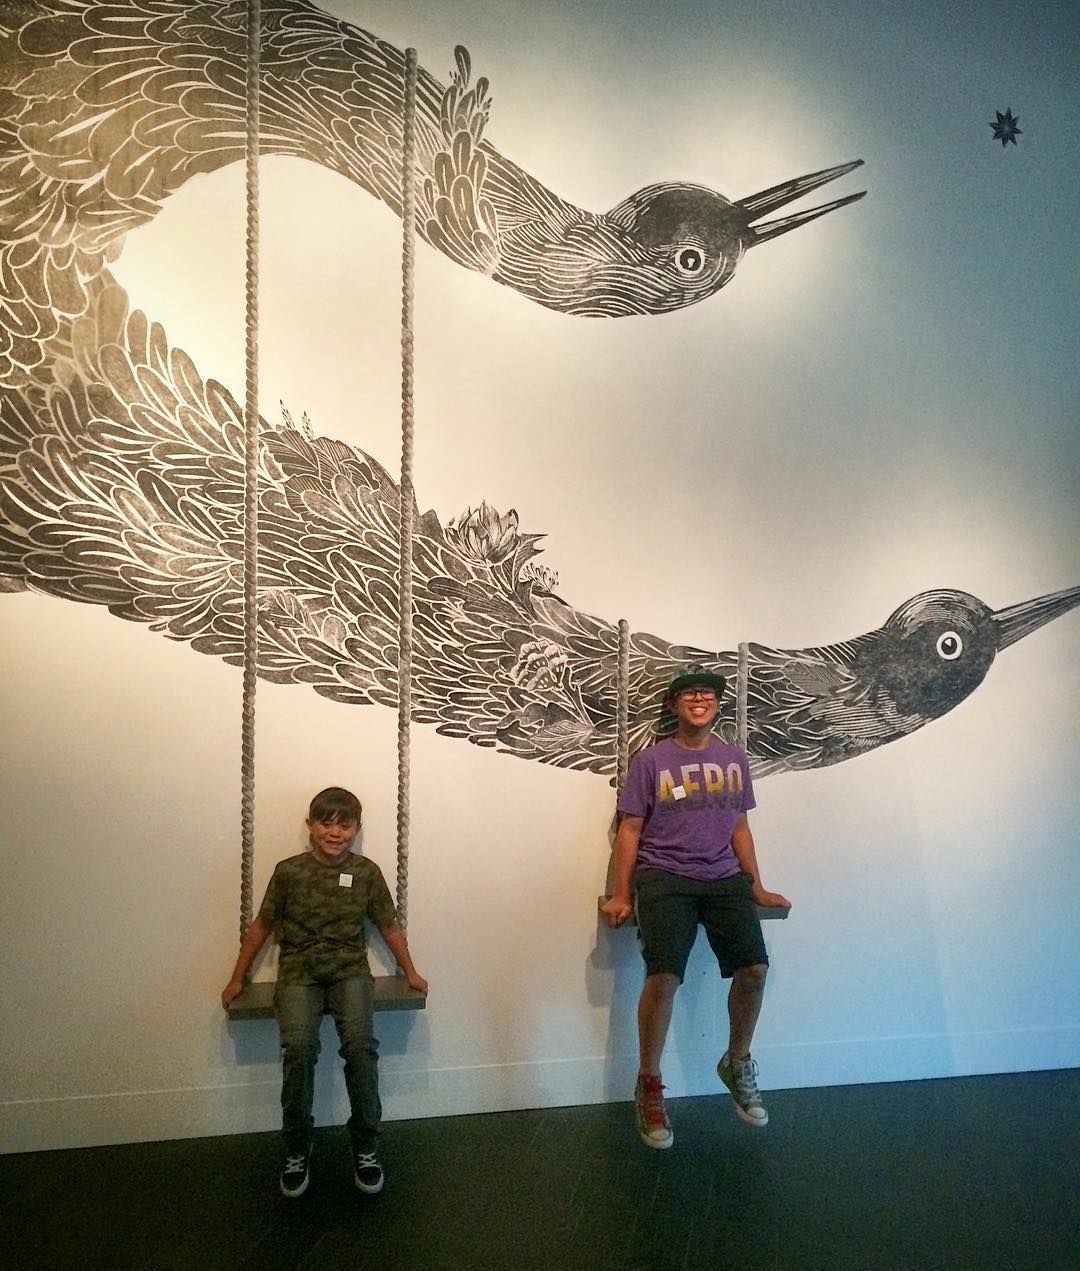 Denver art museum instagram photos and videos with